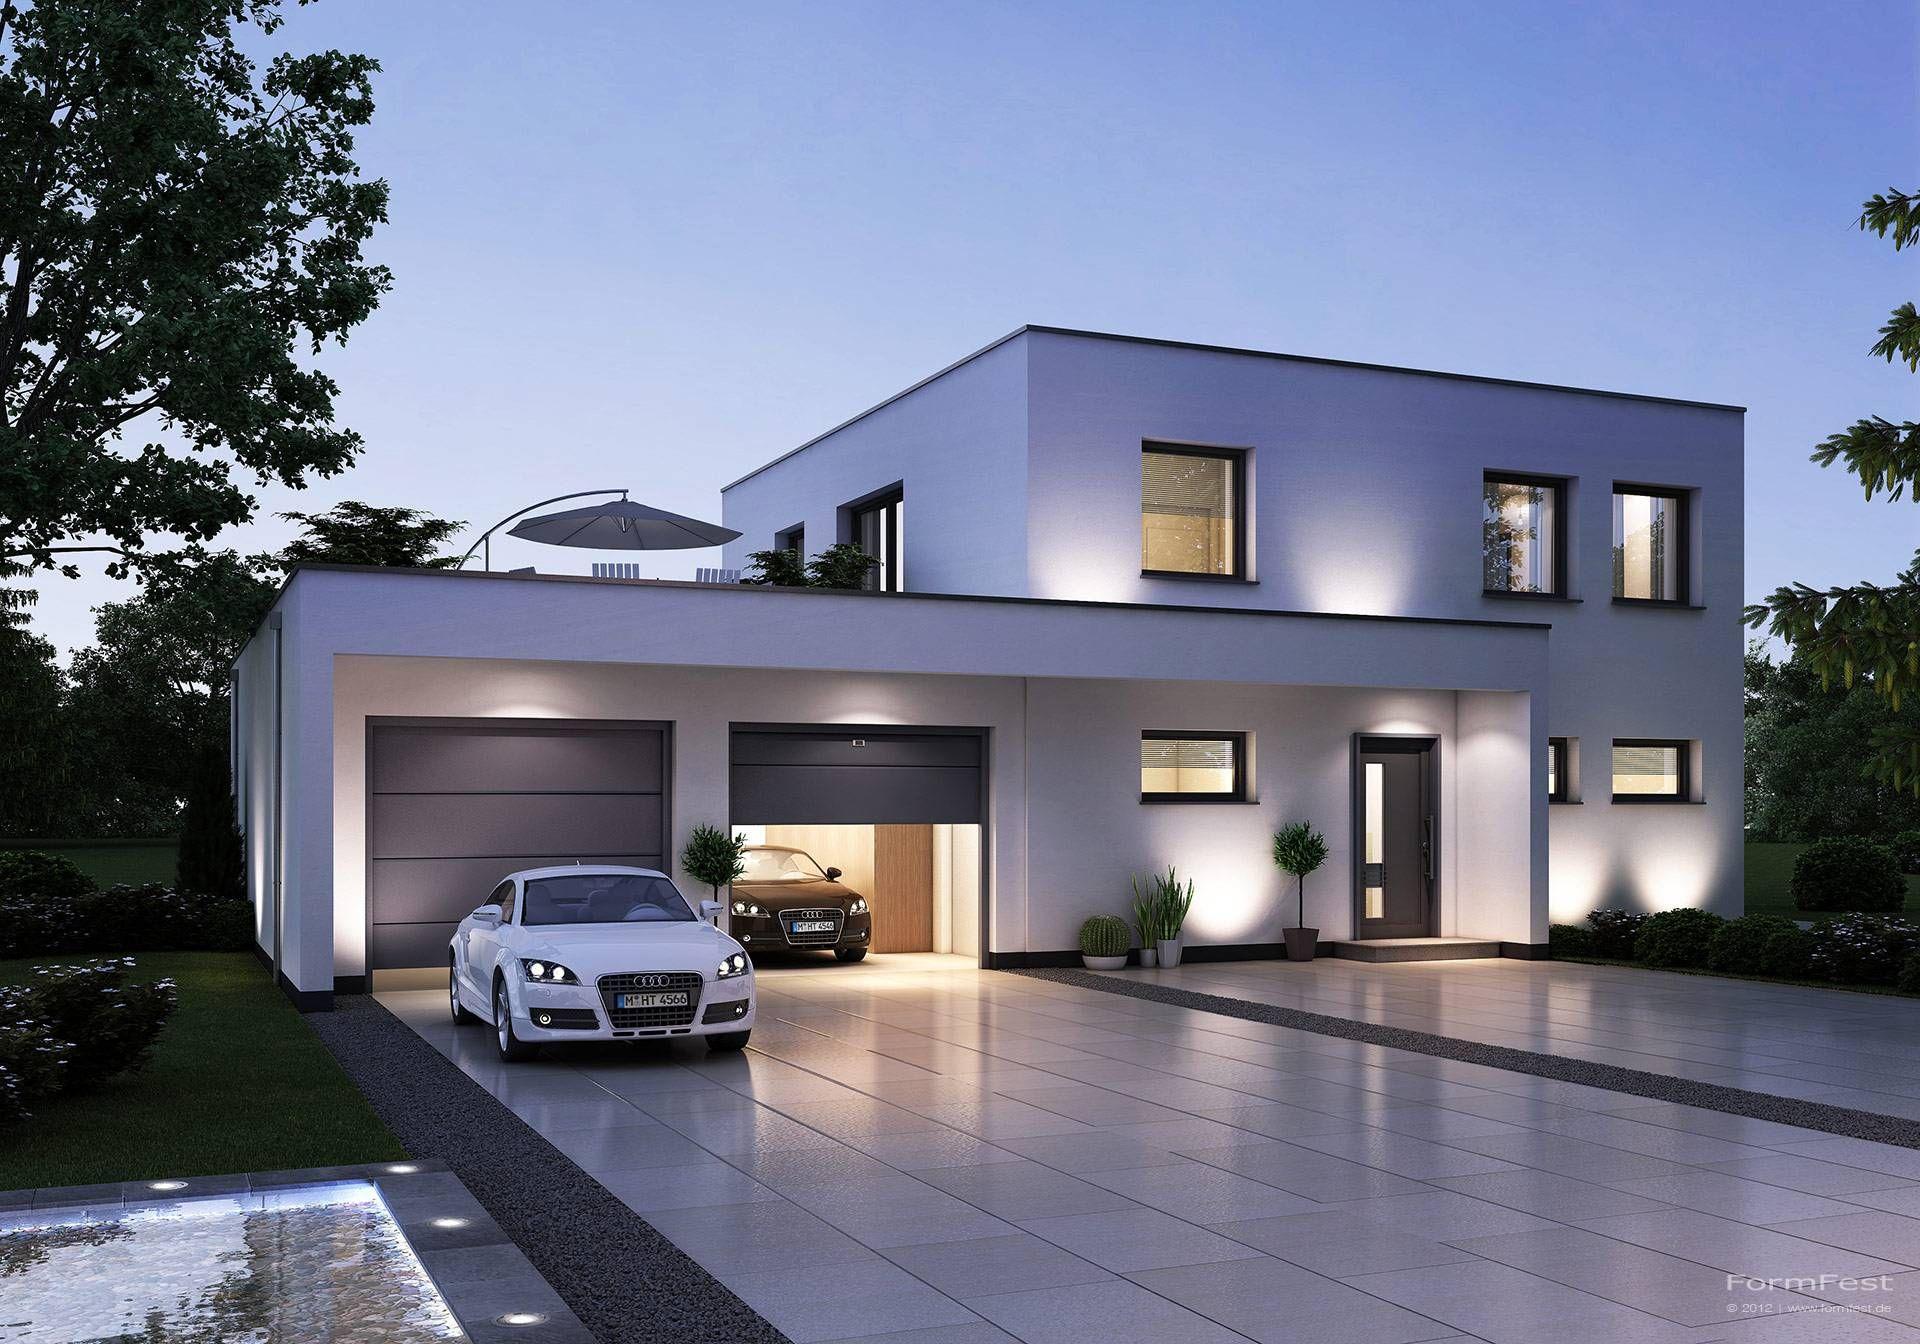 Einfamilienh\u00e4user FormFest villa etage Pinterest